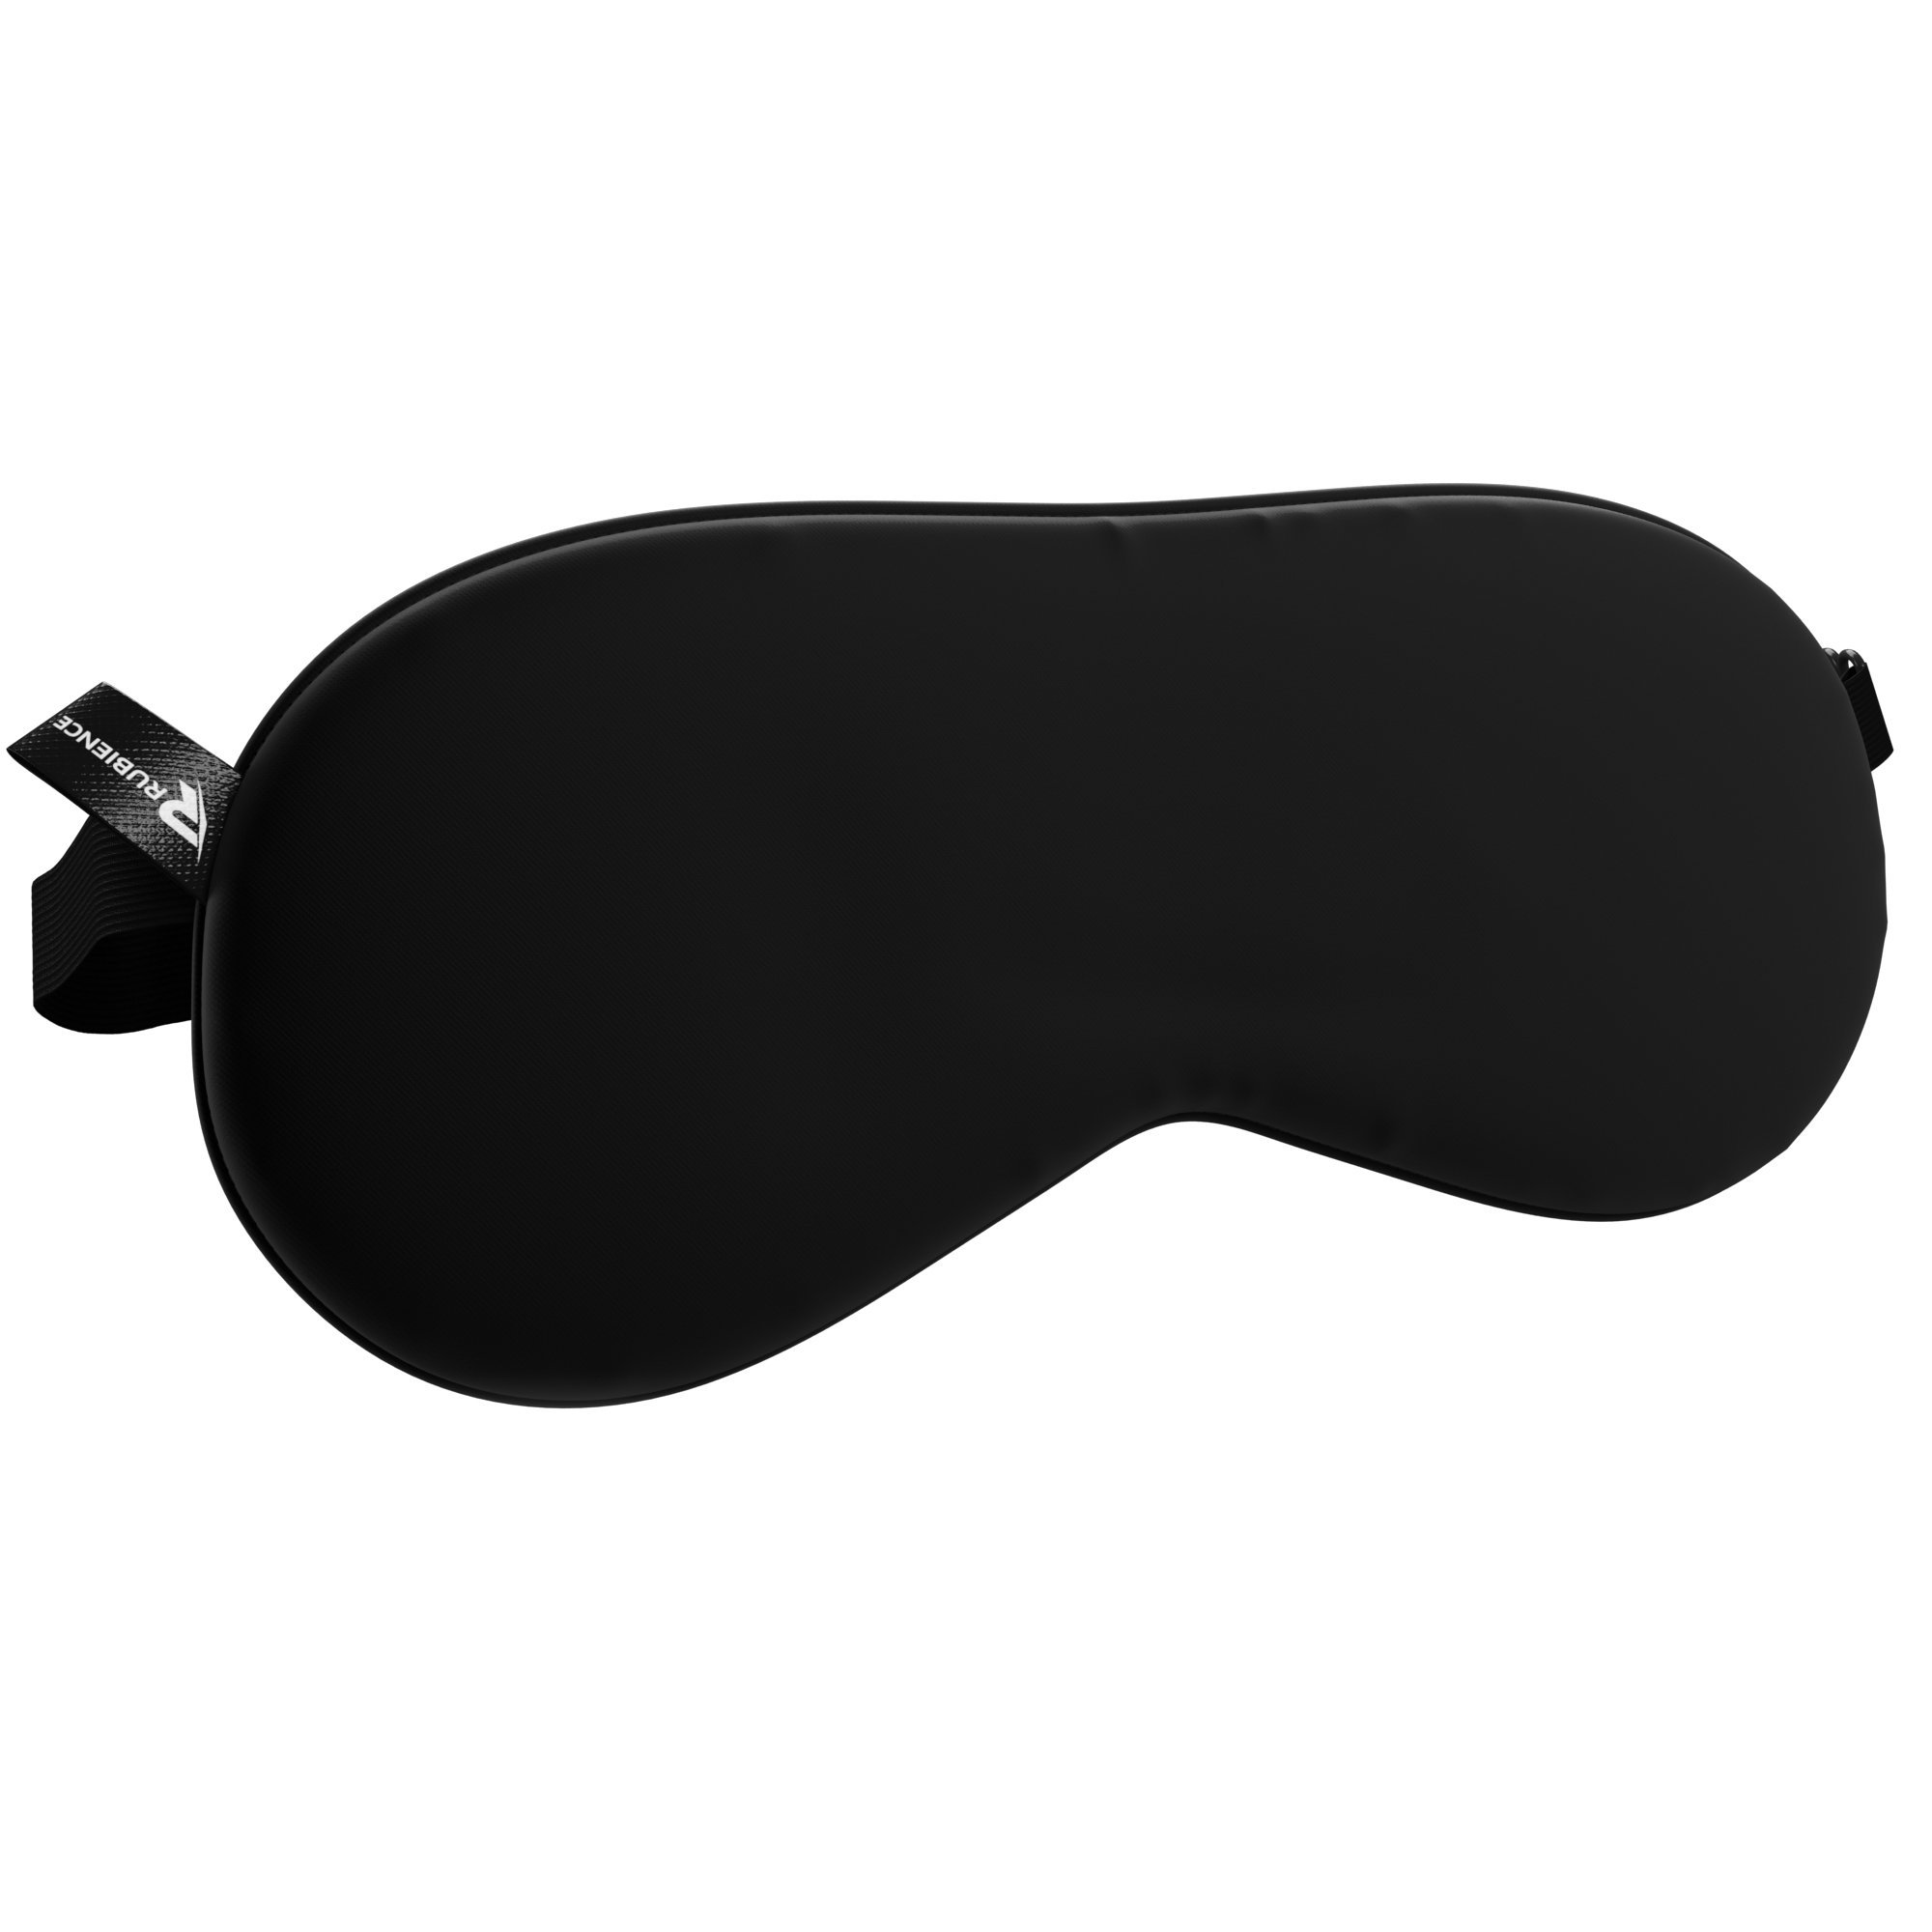 Rubience Sleep Mask, Silk Sleeping Eye Mask, Comfortable Sleep Aid Blindfold for Women and Men, Black